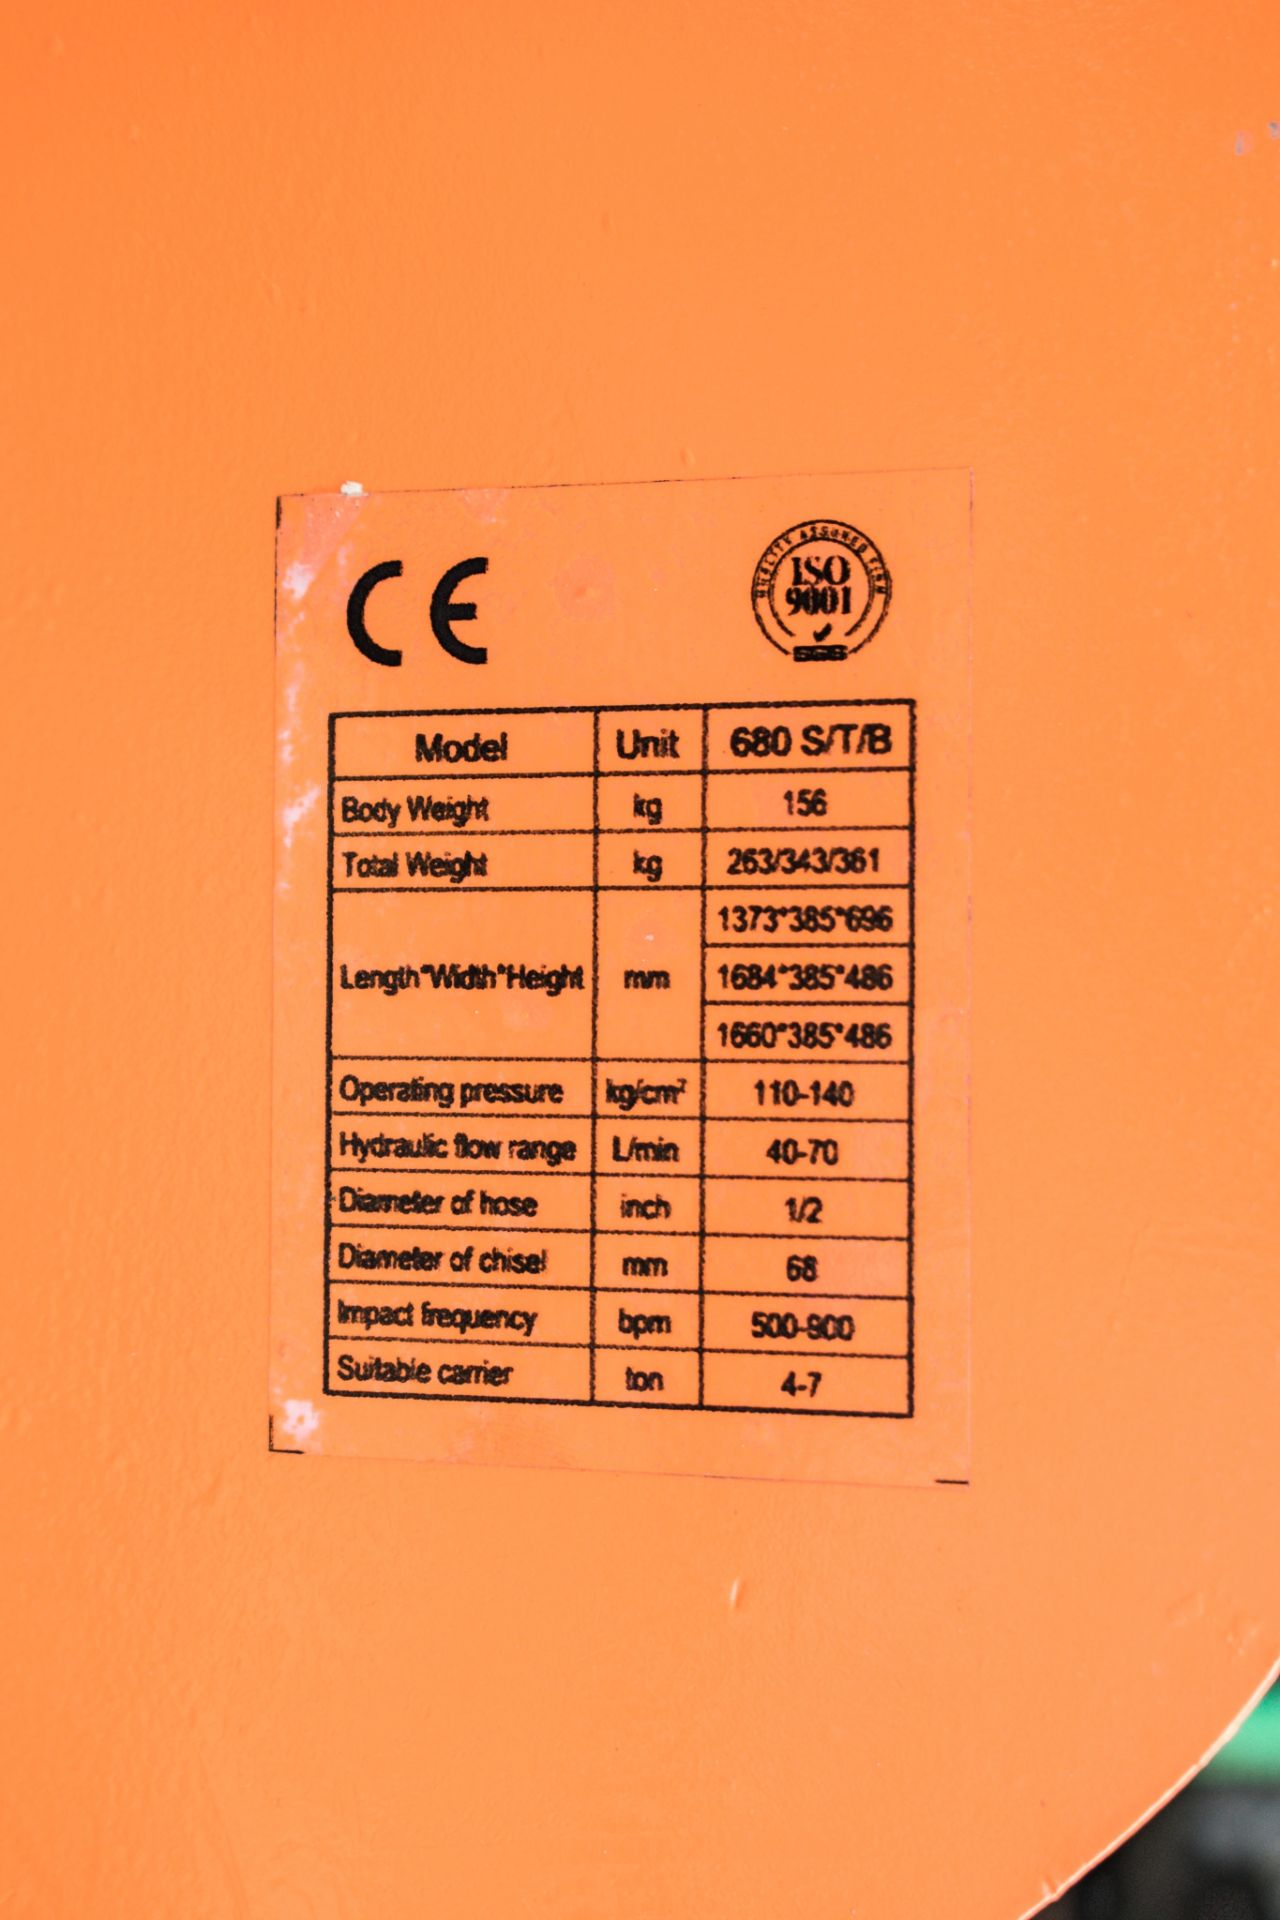 Lot 251 - Hirox 680 S/t/B hydraulic breaker to suit 4 to 7 tonne midi excavator ** Unused **